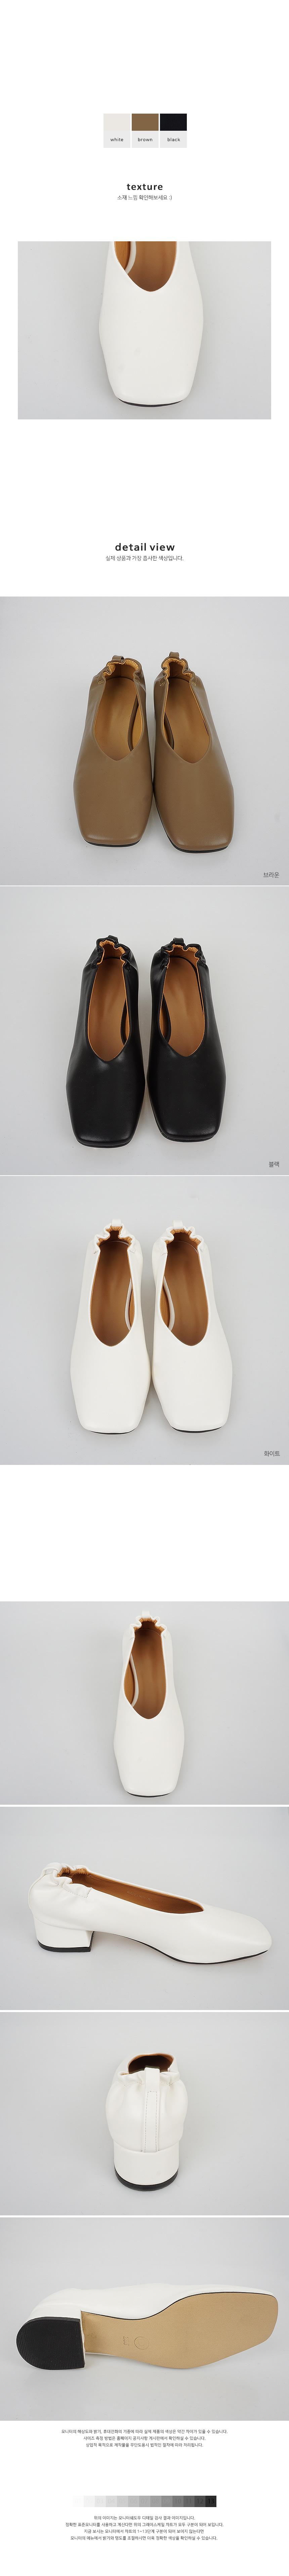 Lounge banding shoes